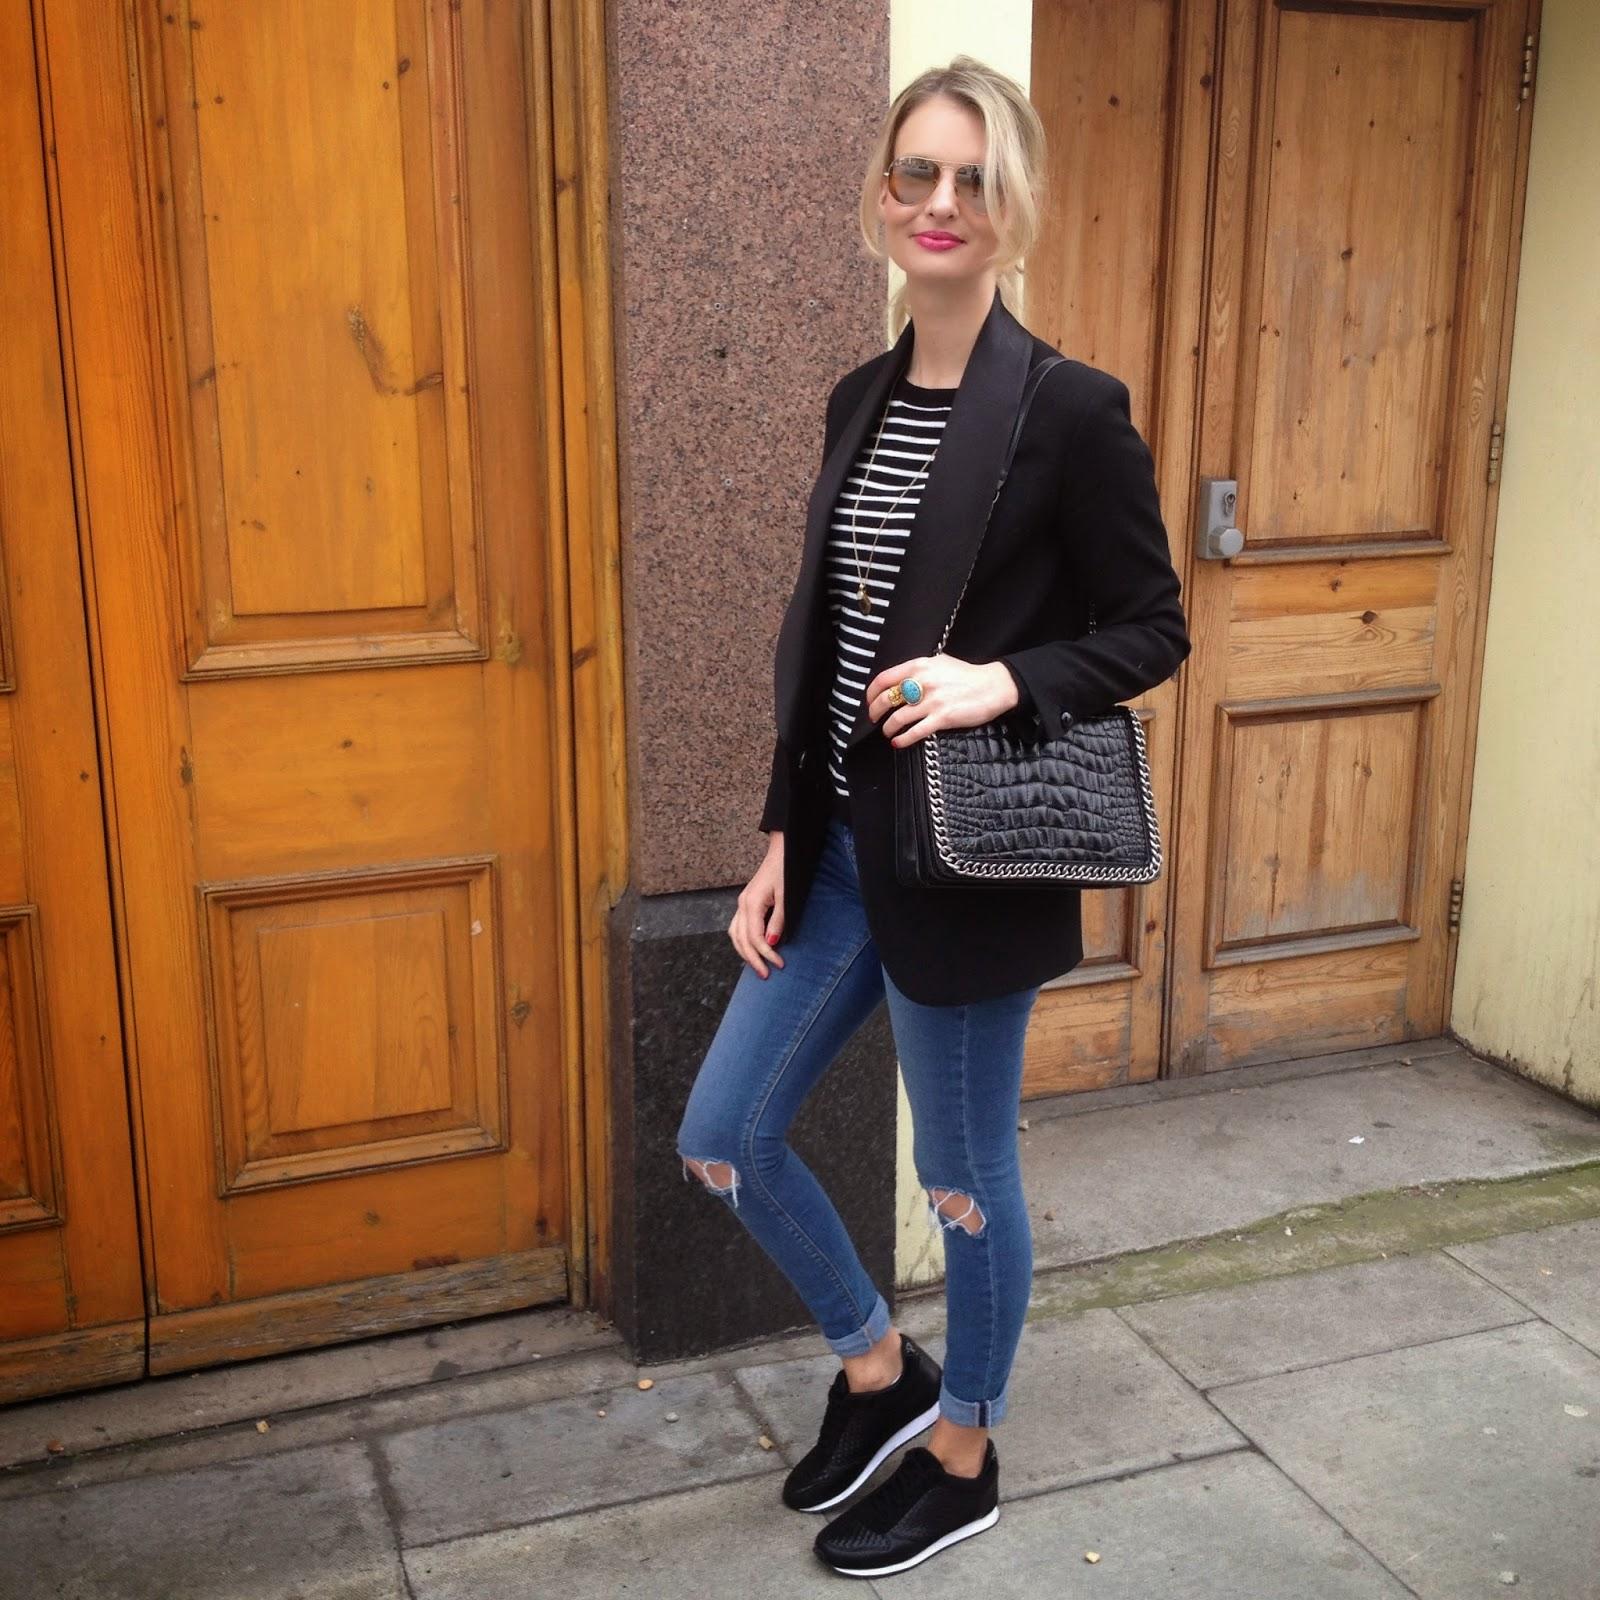 wardrobe staples, street style, fashion blogger, street style blogger